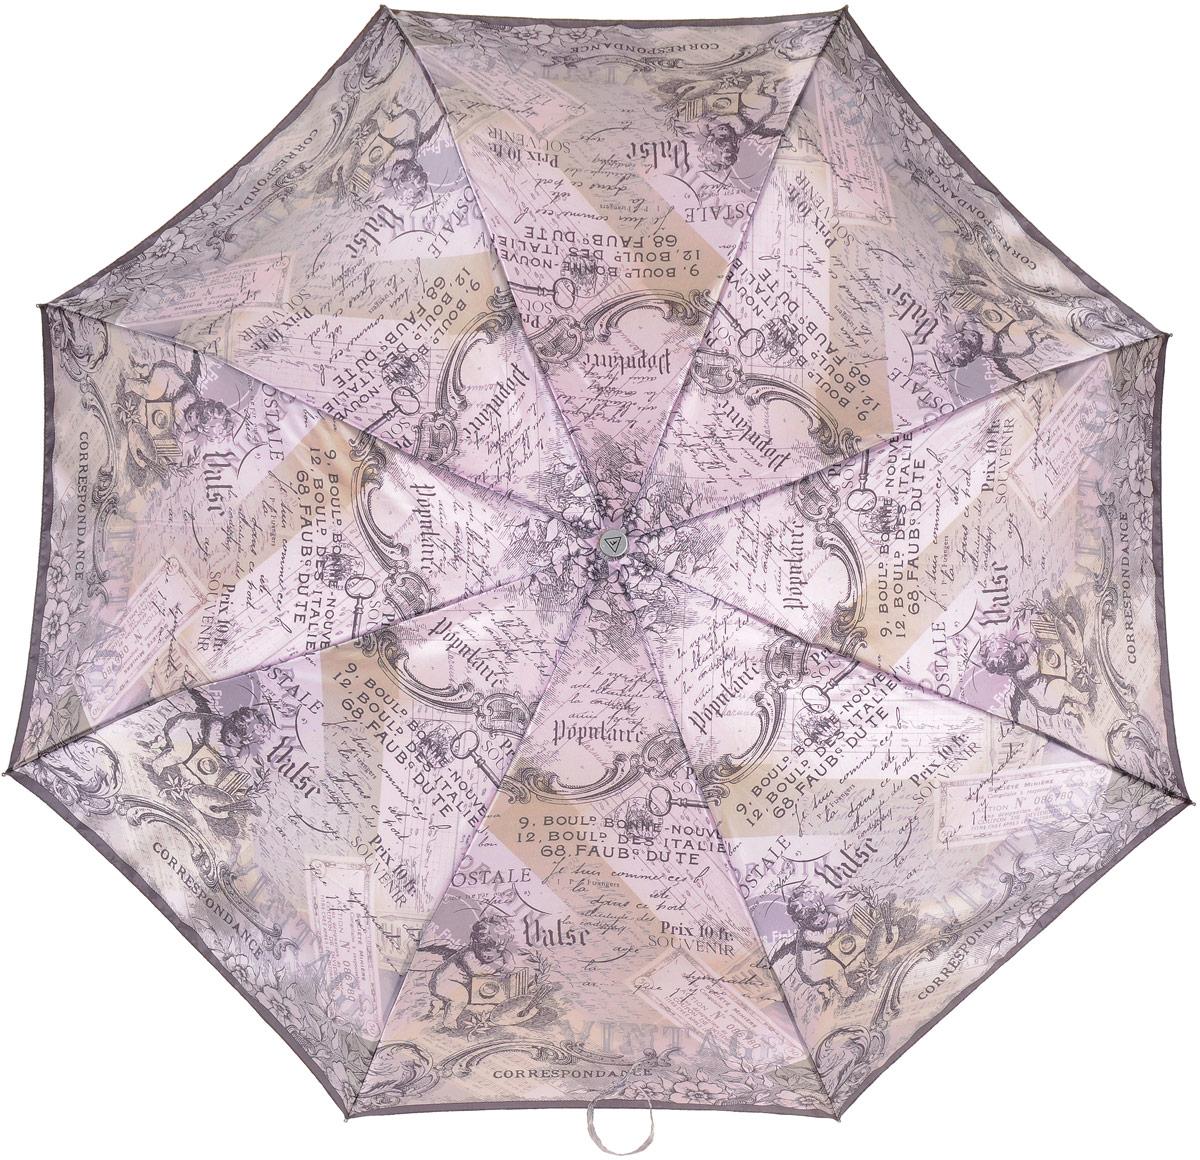 Зонт женский Fabretti, автомат, 3 сложения, цвет: сиреневый, черный. L-17100-2 цена и фото